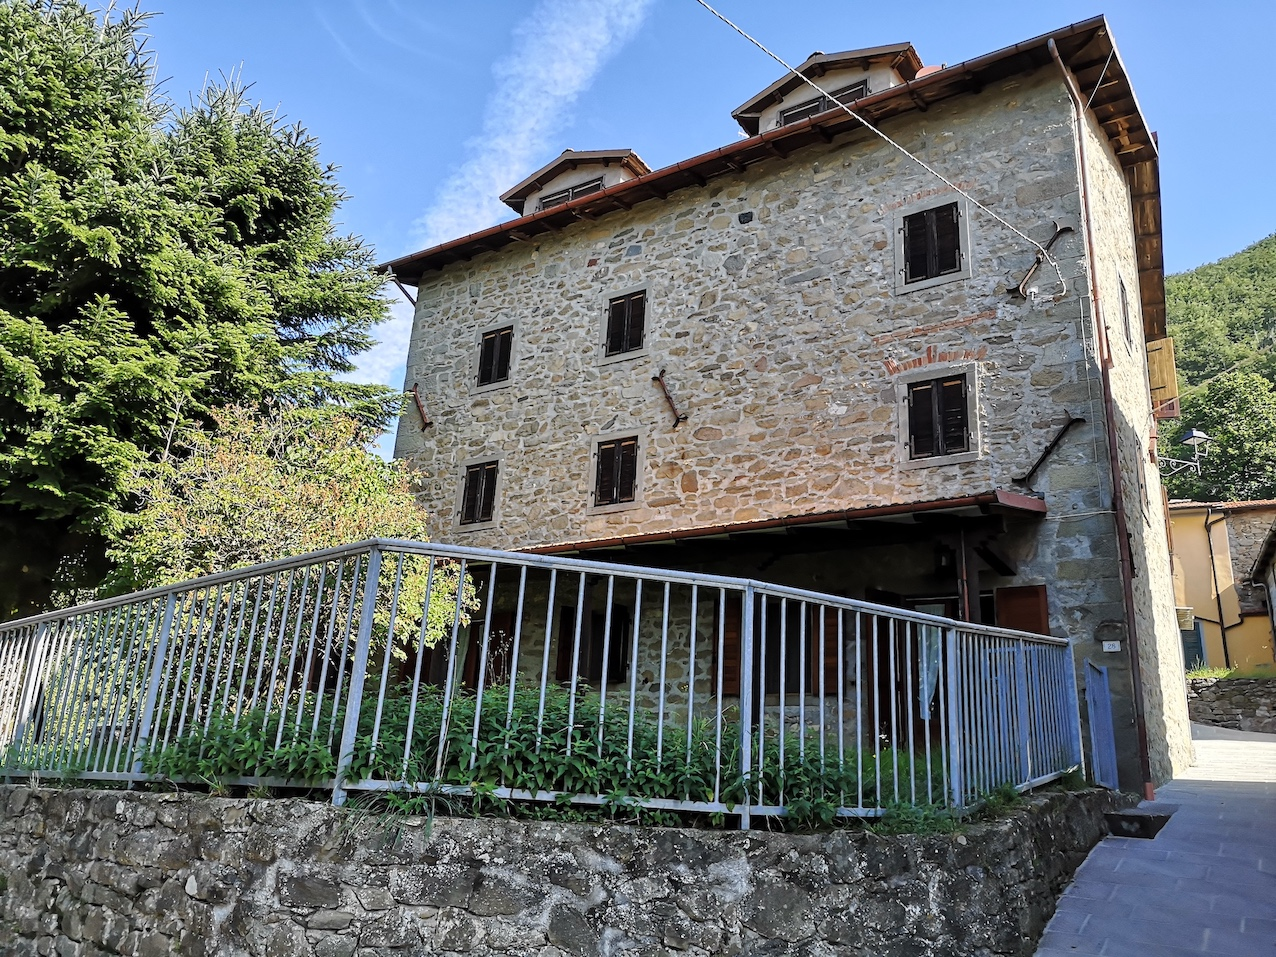 Nice medieval house in Garfagnana